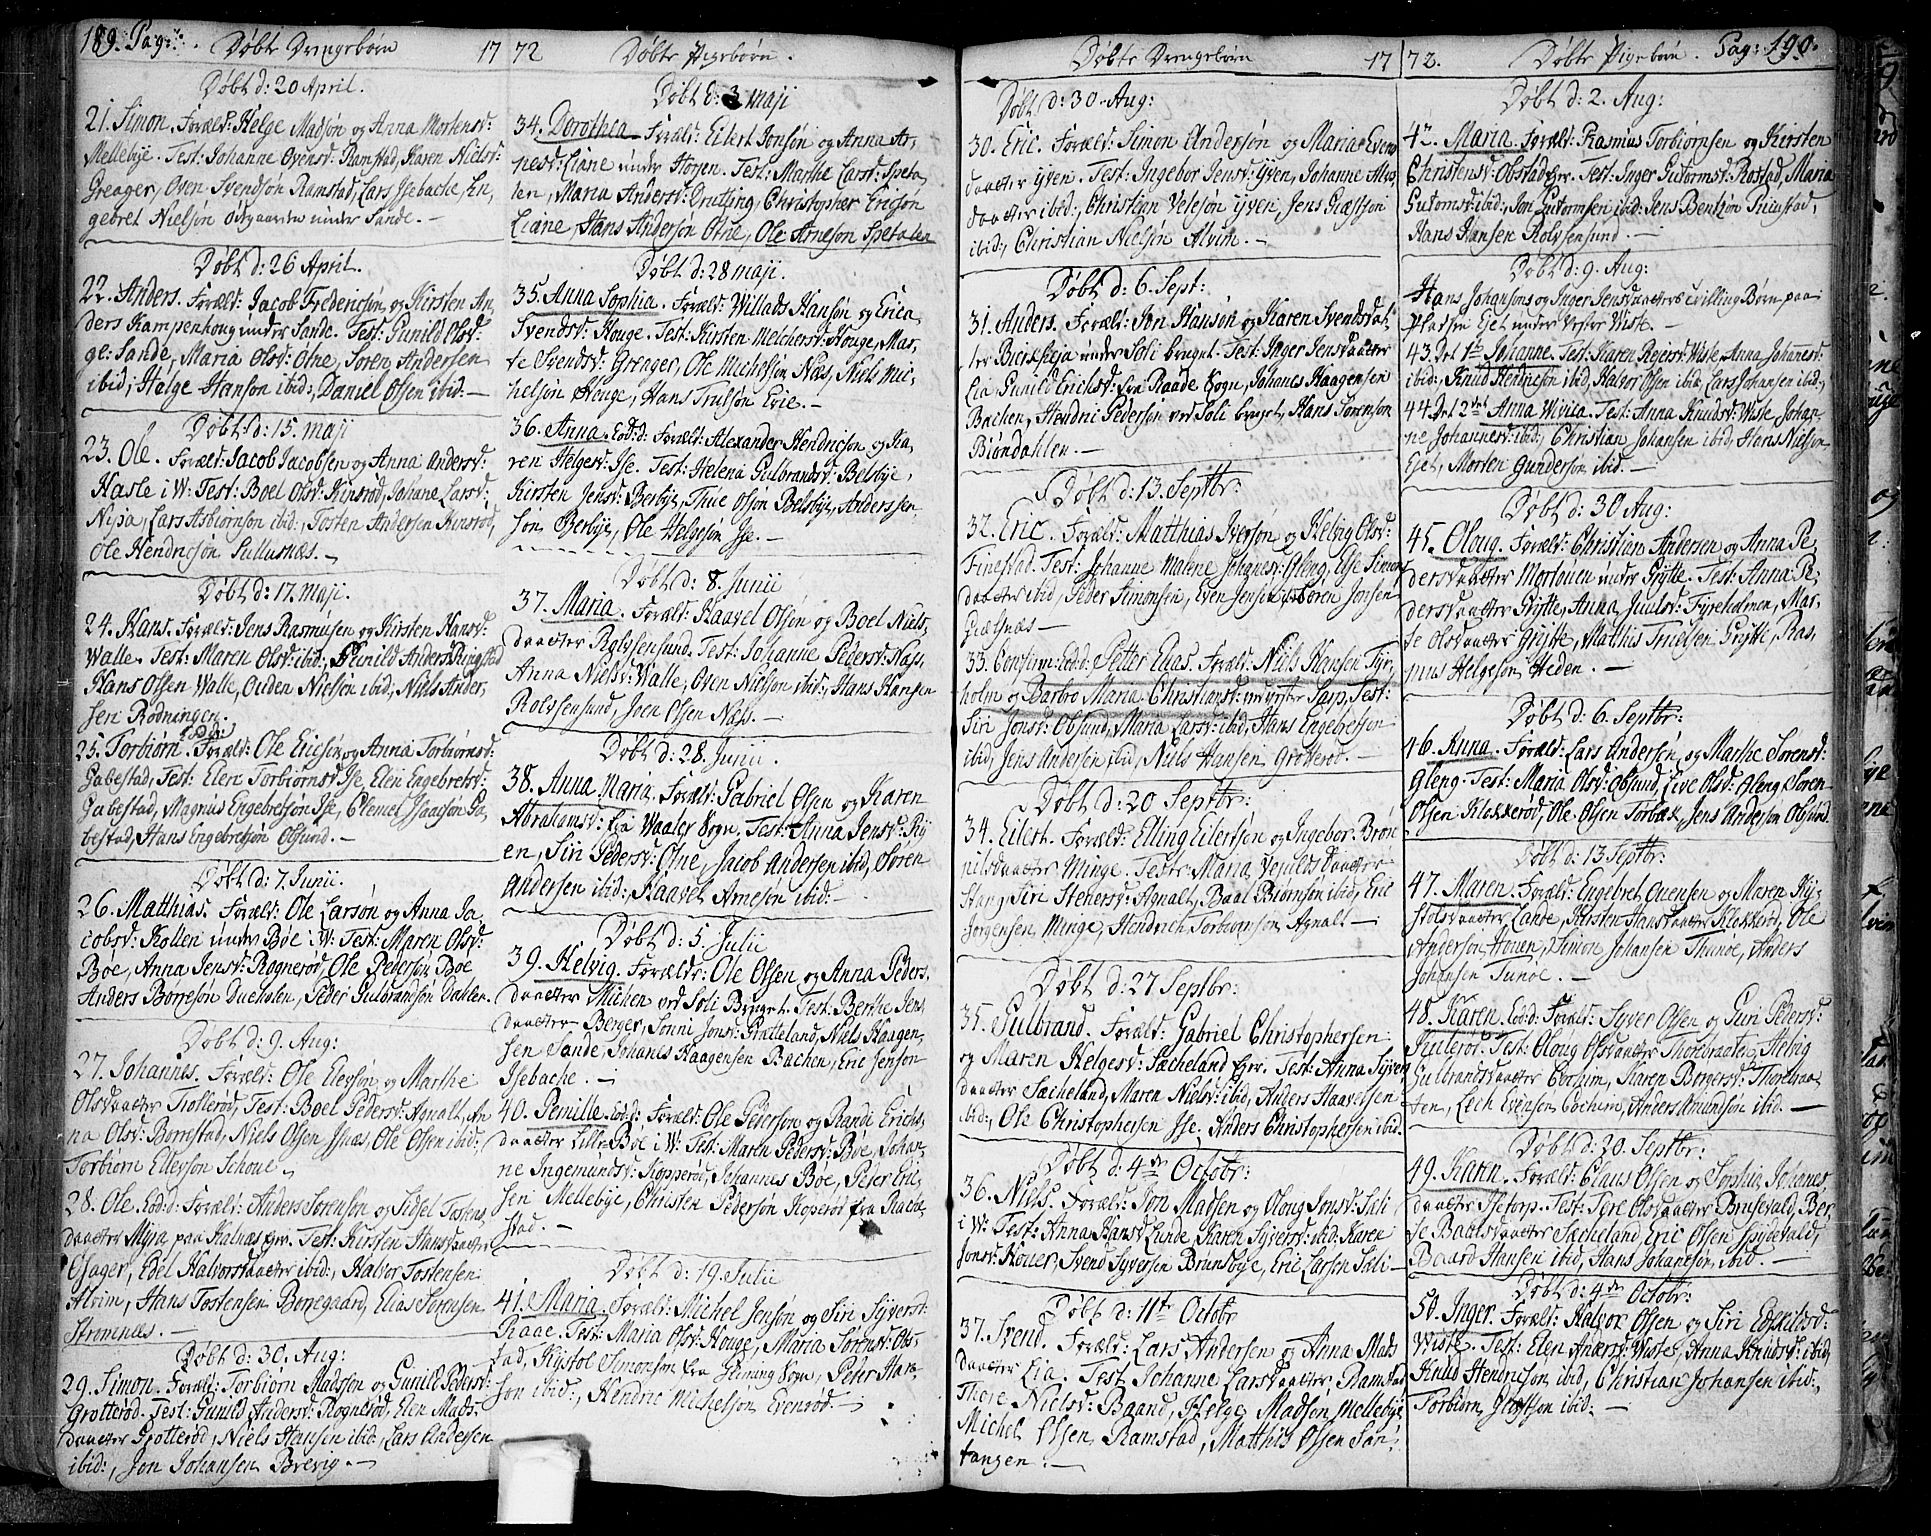 SAO, Tune prestekontor Kirkebøker, F/Fa/L0002: Parish register (official) no. 2, 1758-1781, p. 189-190